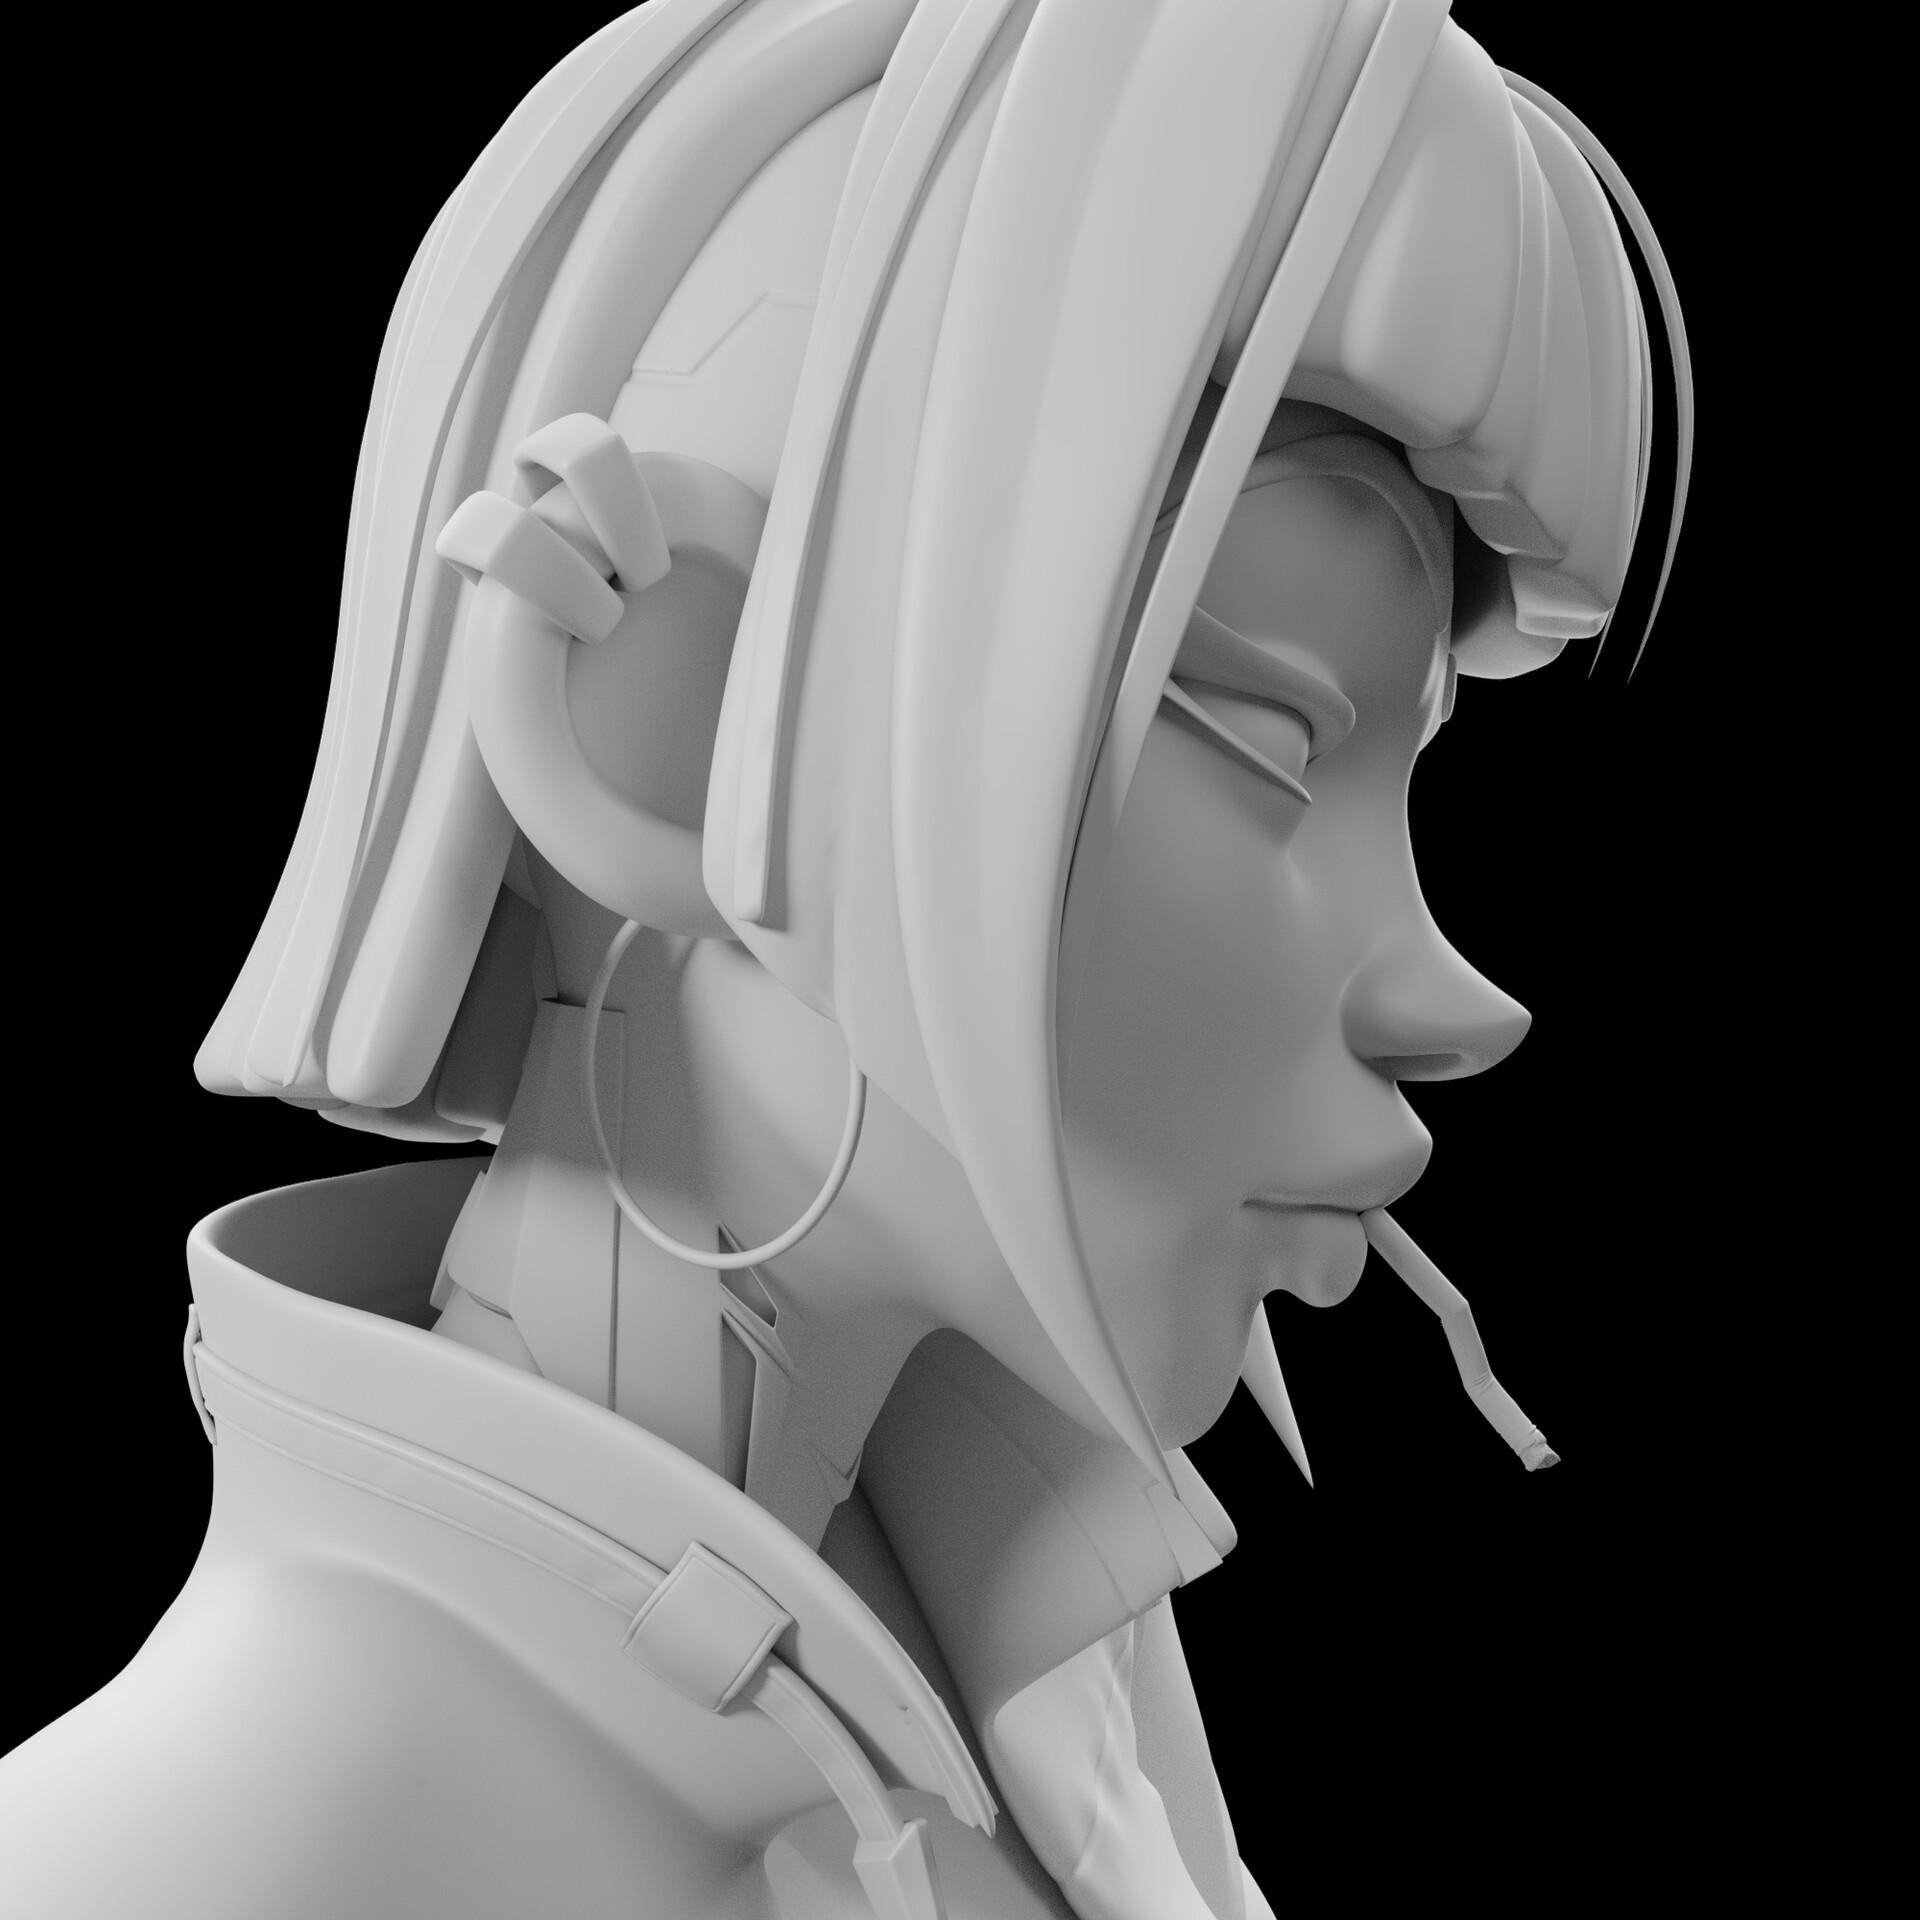 Sergi camprubi detail clay render 02